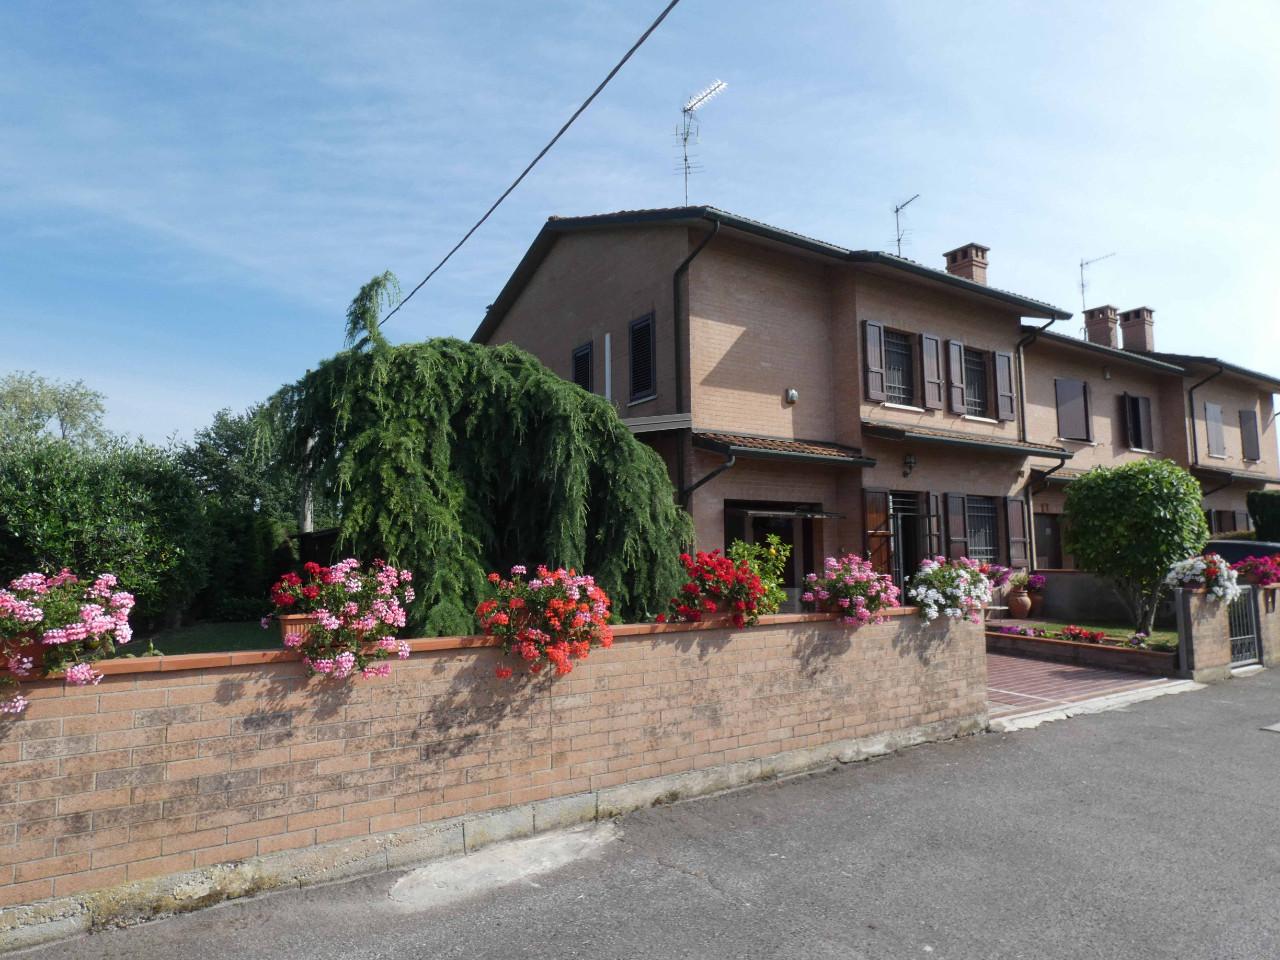 Villetta  Di Testa in vendita Ferrara Zona Via Ravenna